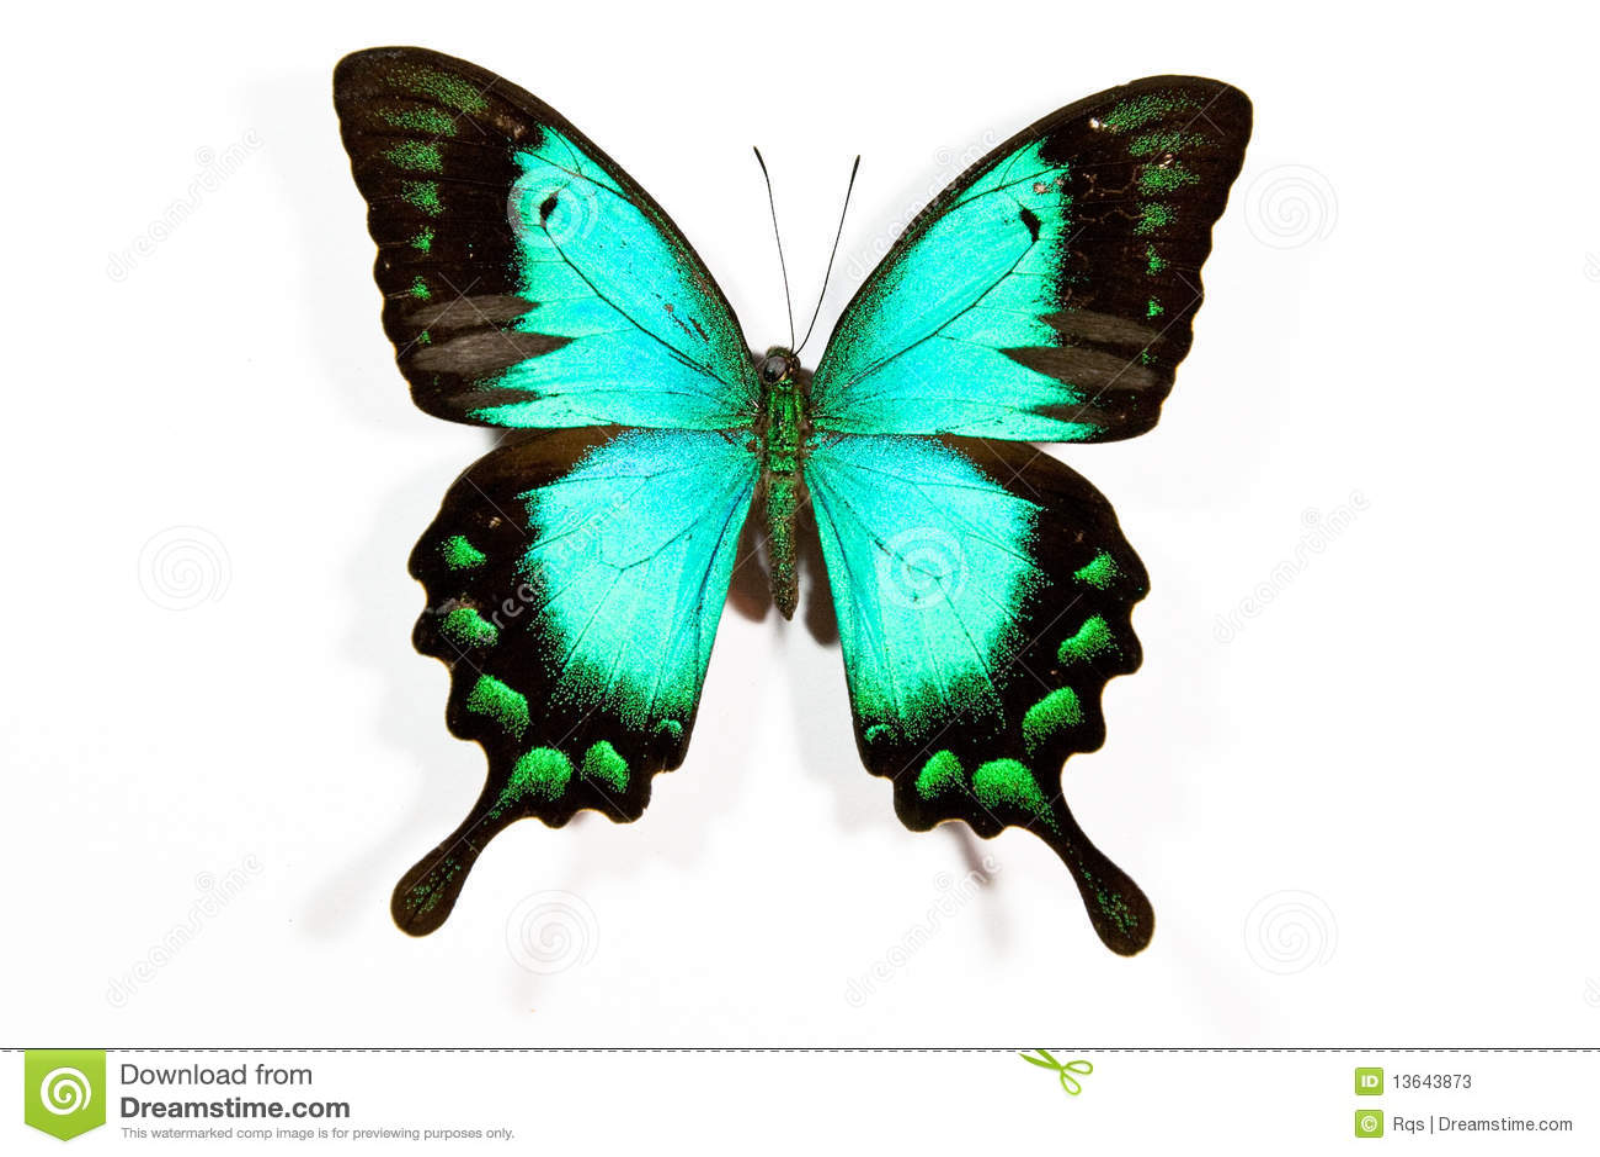 lorquinianus vert et noir de papilio de guindineau image. Black Bedroom Furniture Sets. Home Design Ideas